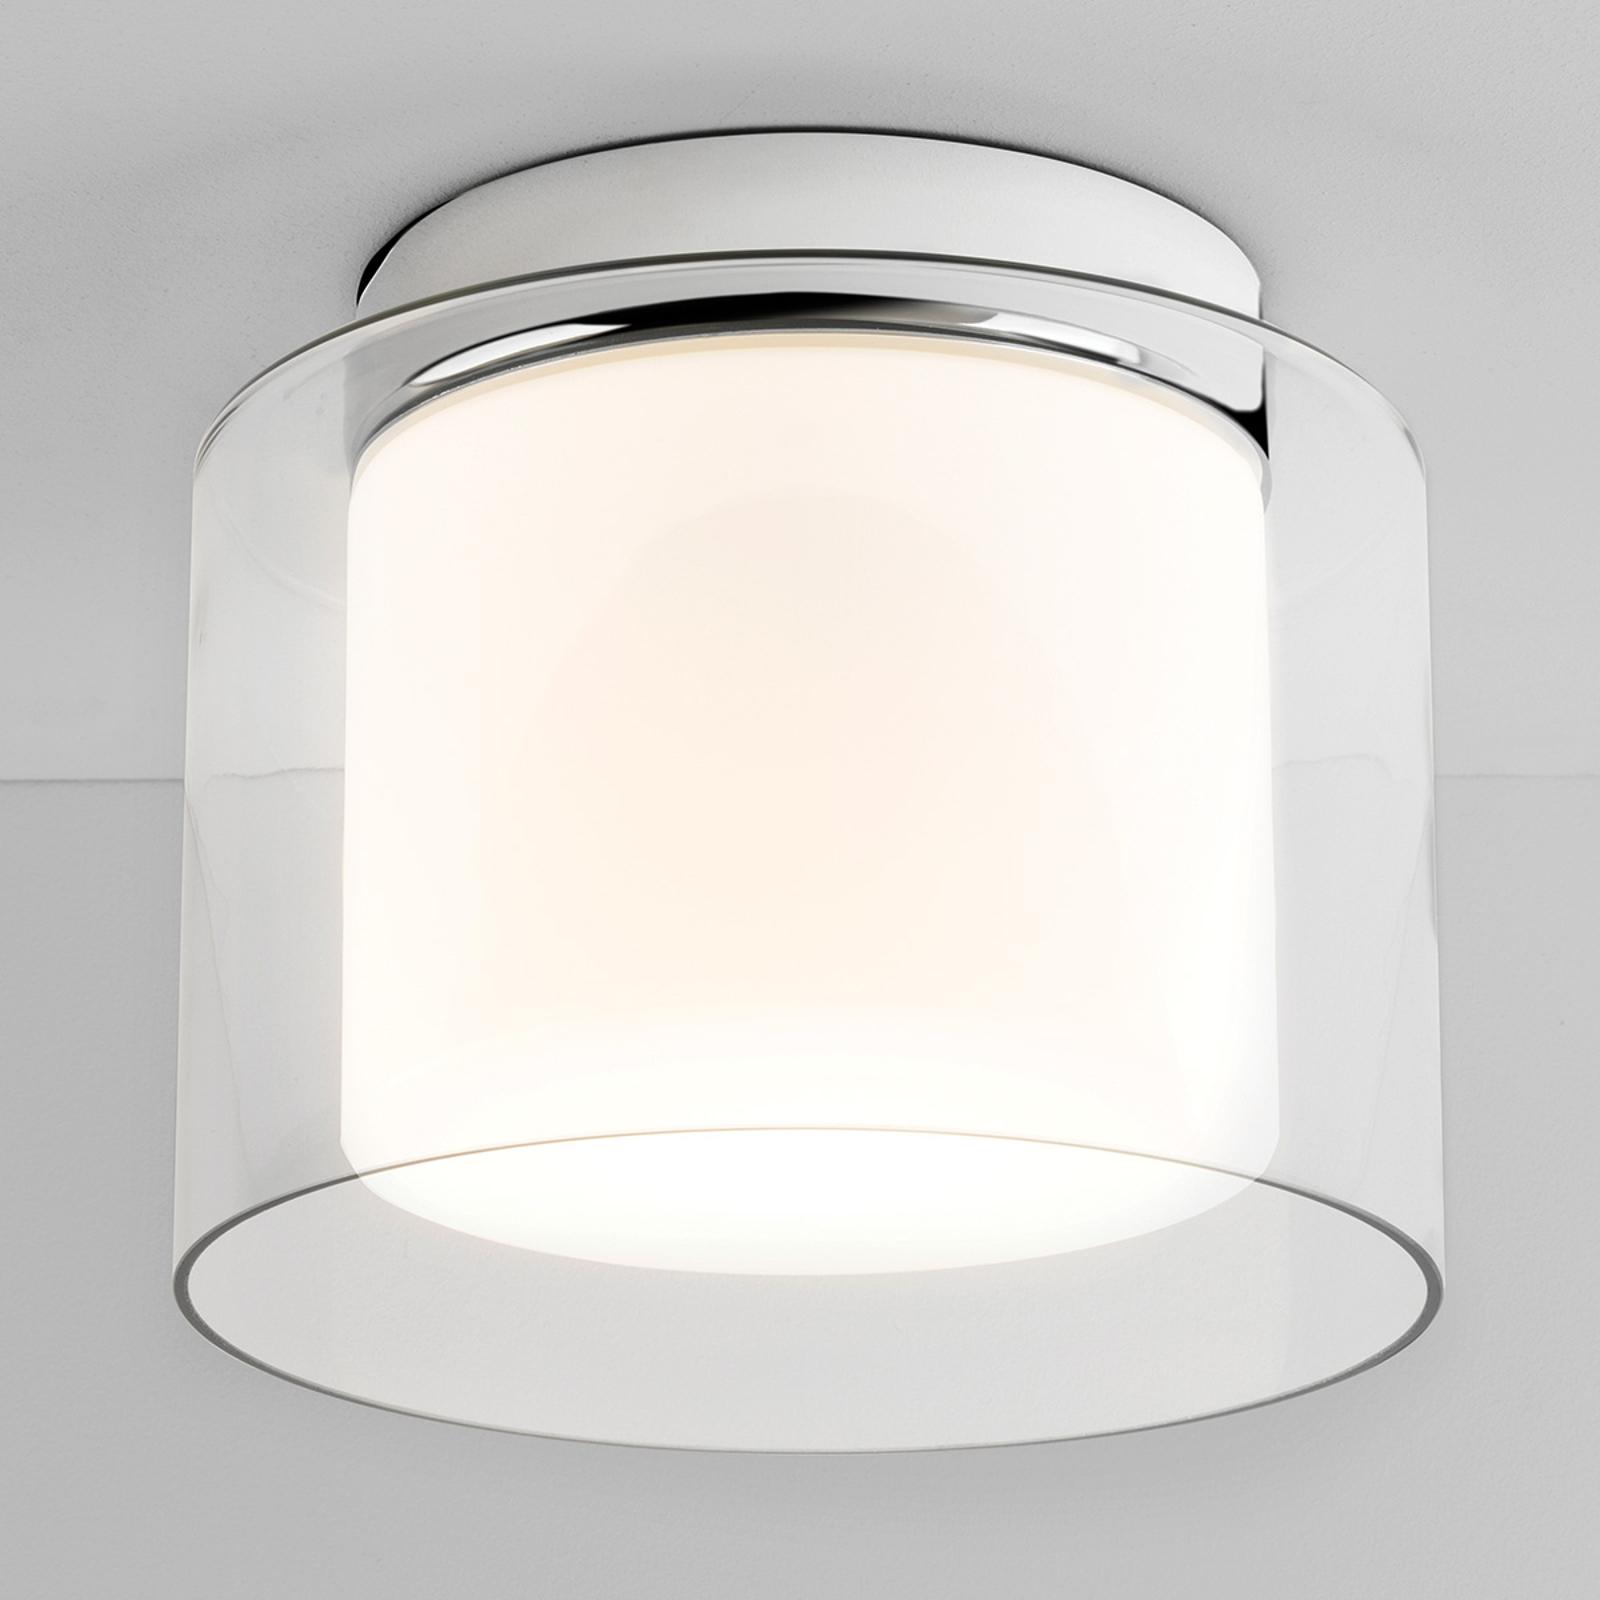 Double glazed ceiling light AREZZO_1020391_1